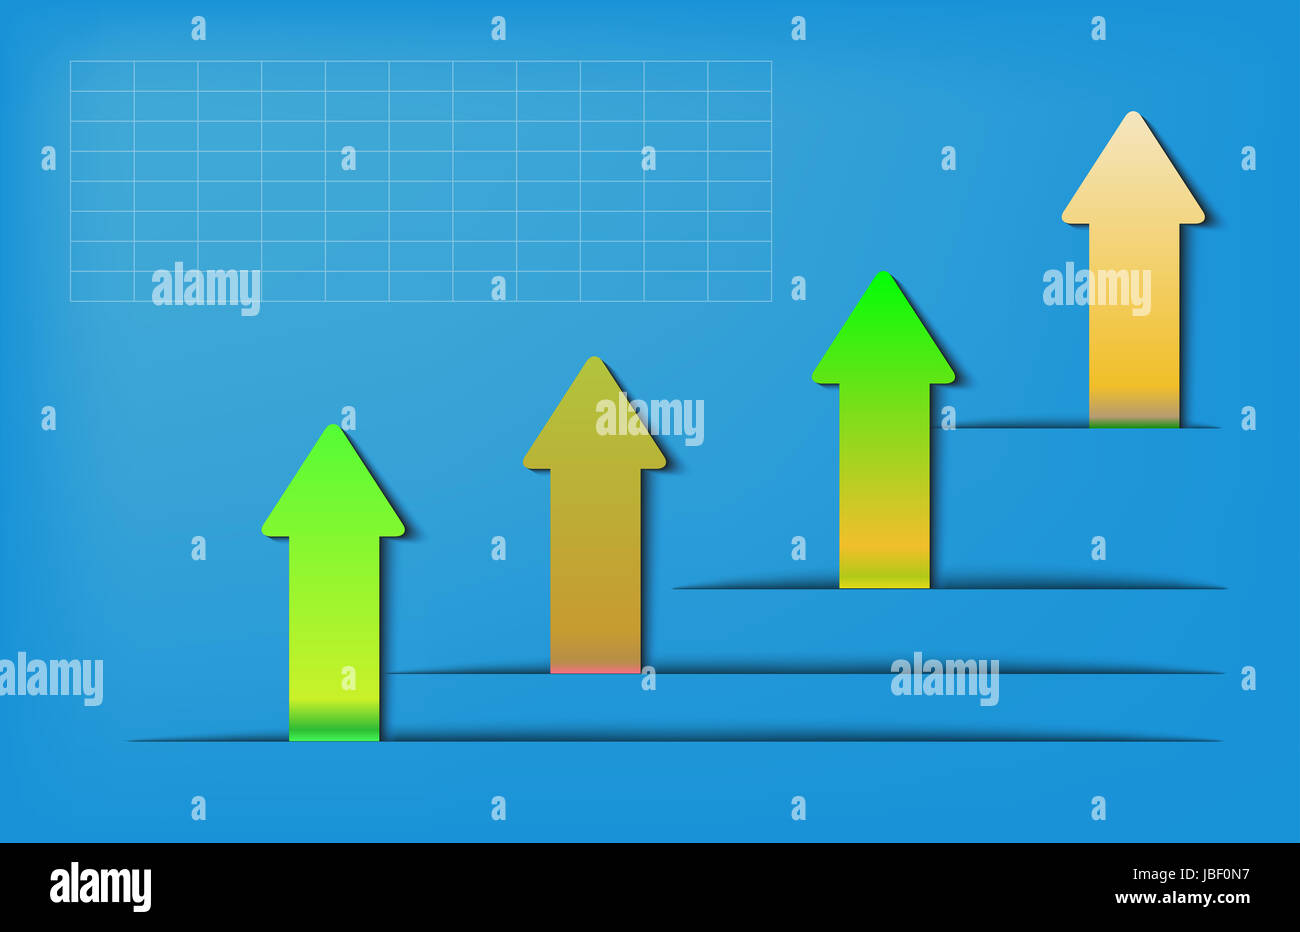 arrow shaddow - Stock Image